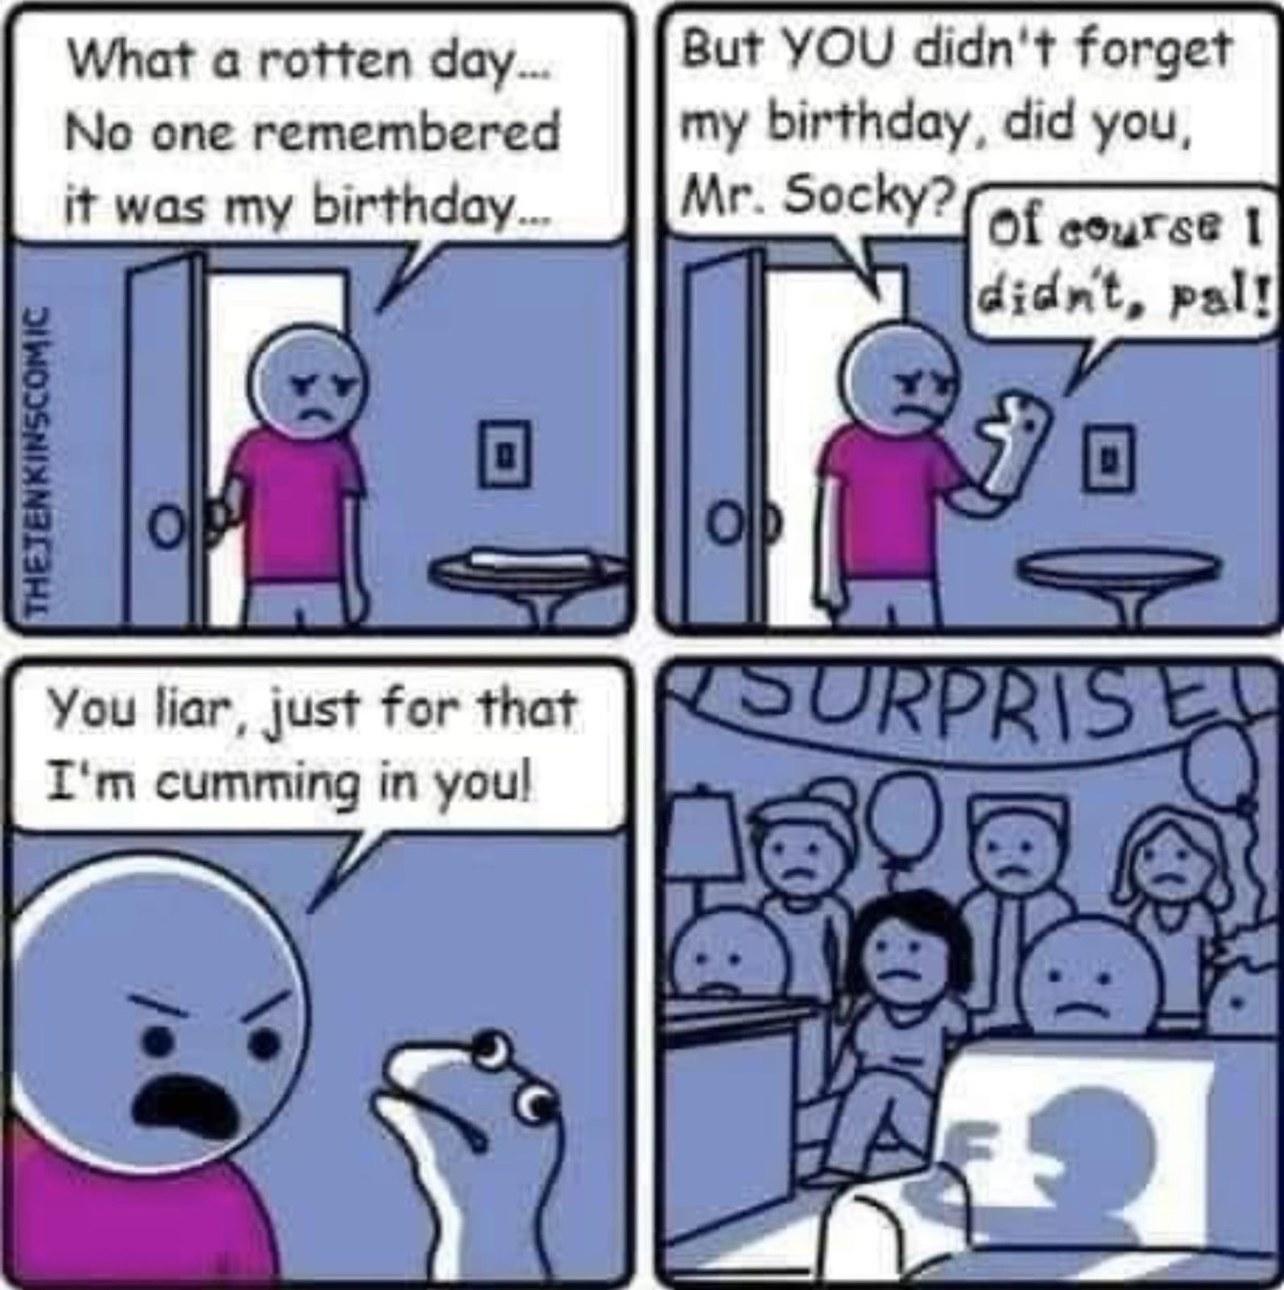 friend sent me this repost - meme